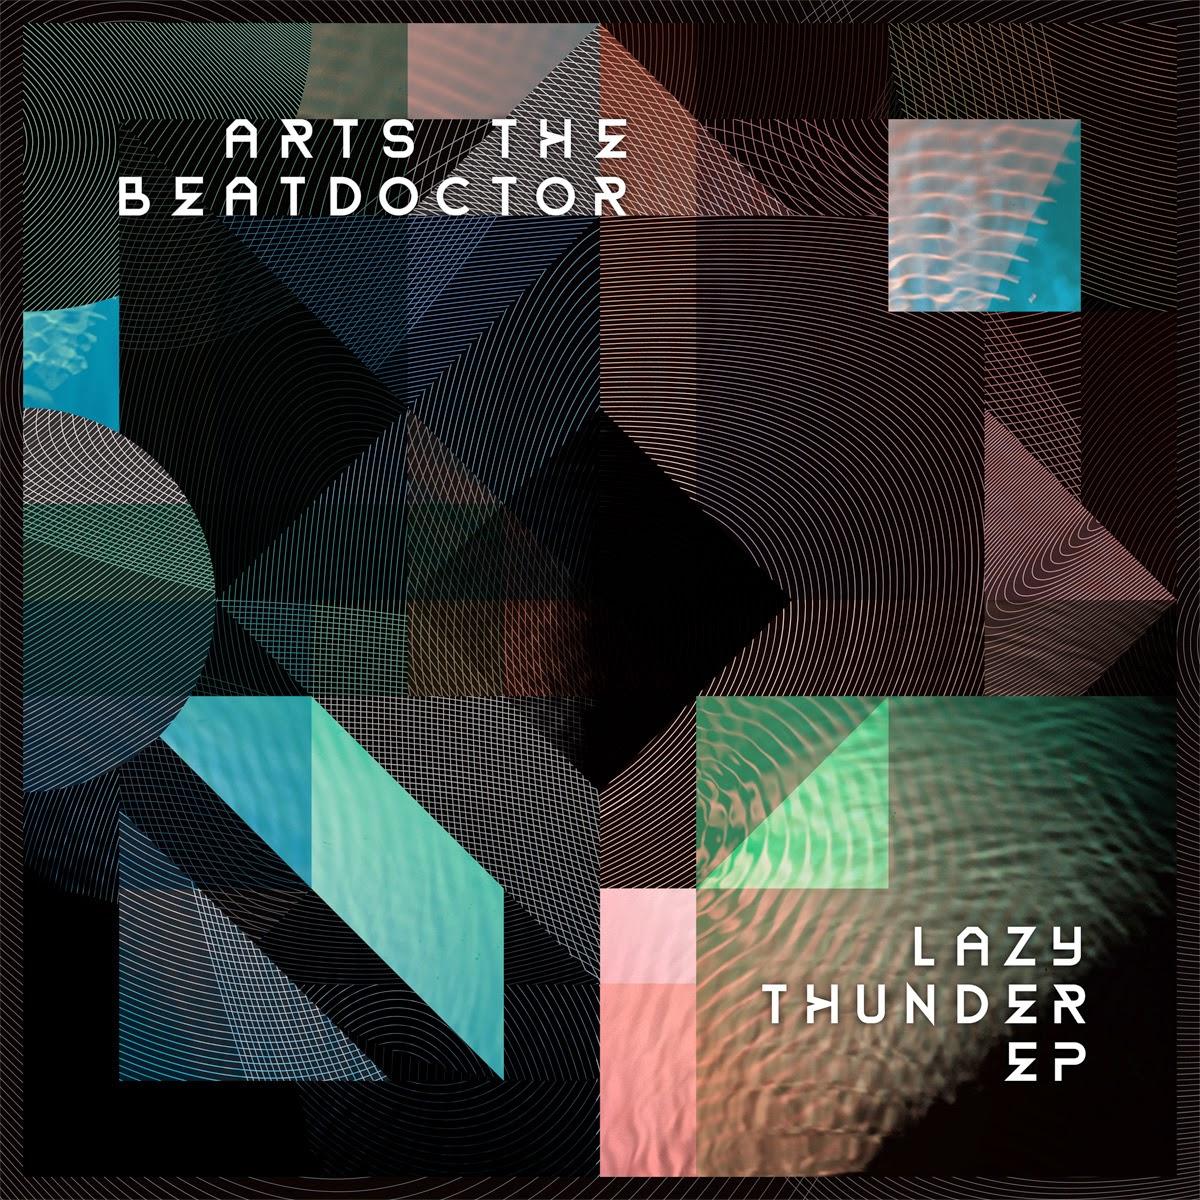 https://artsthebeatdoctor.bandcamp.com/album/lazy-thunder-ep